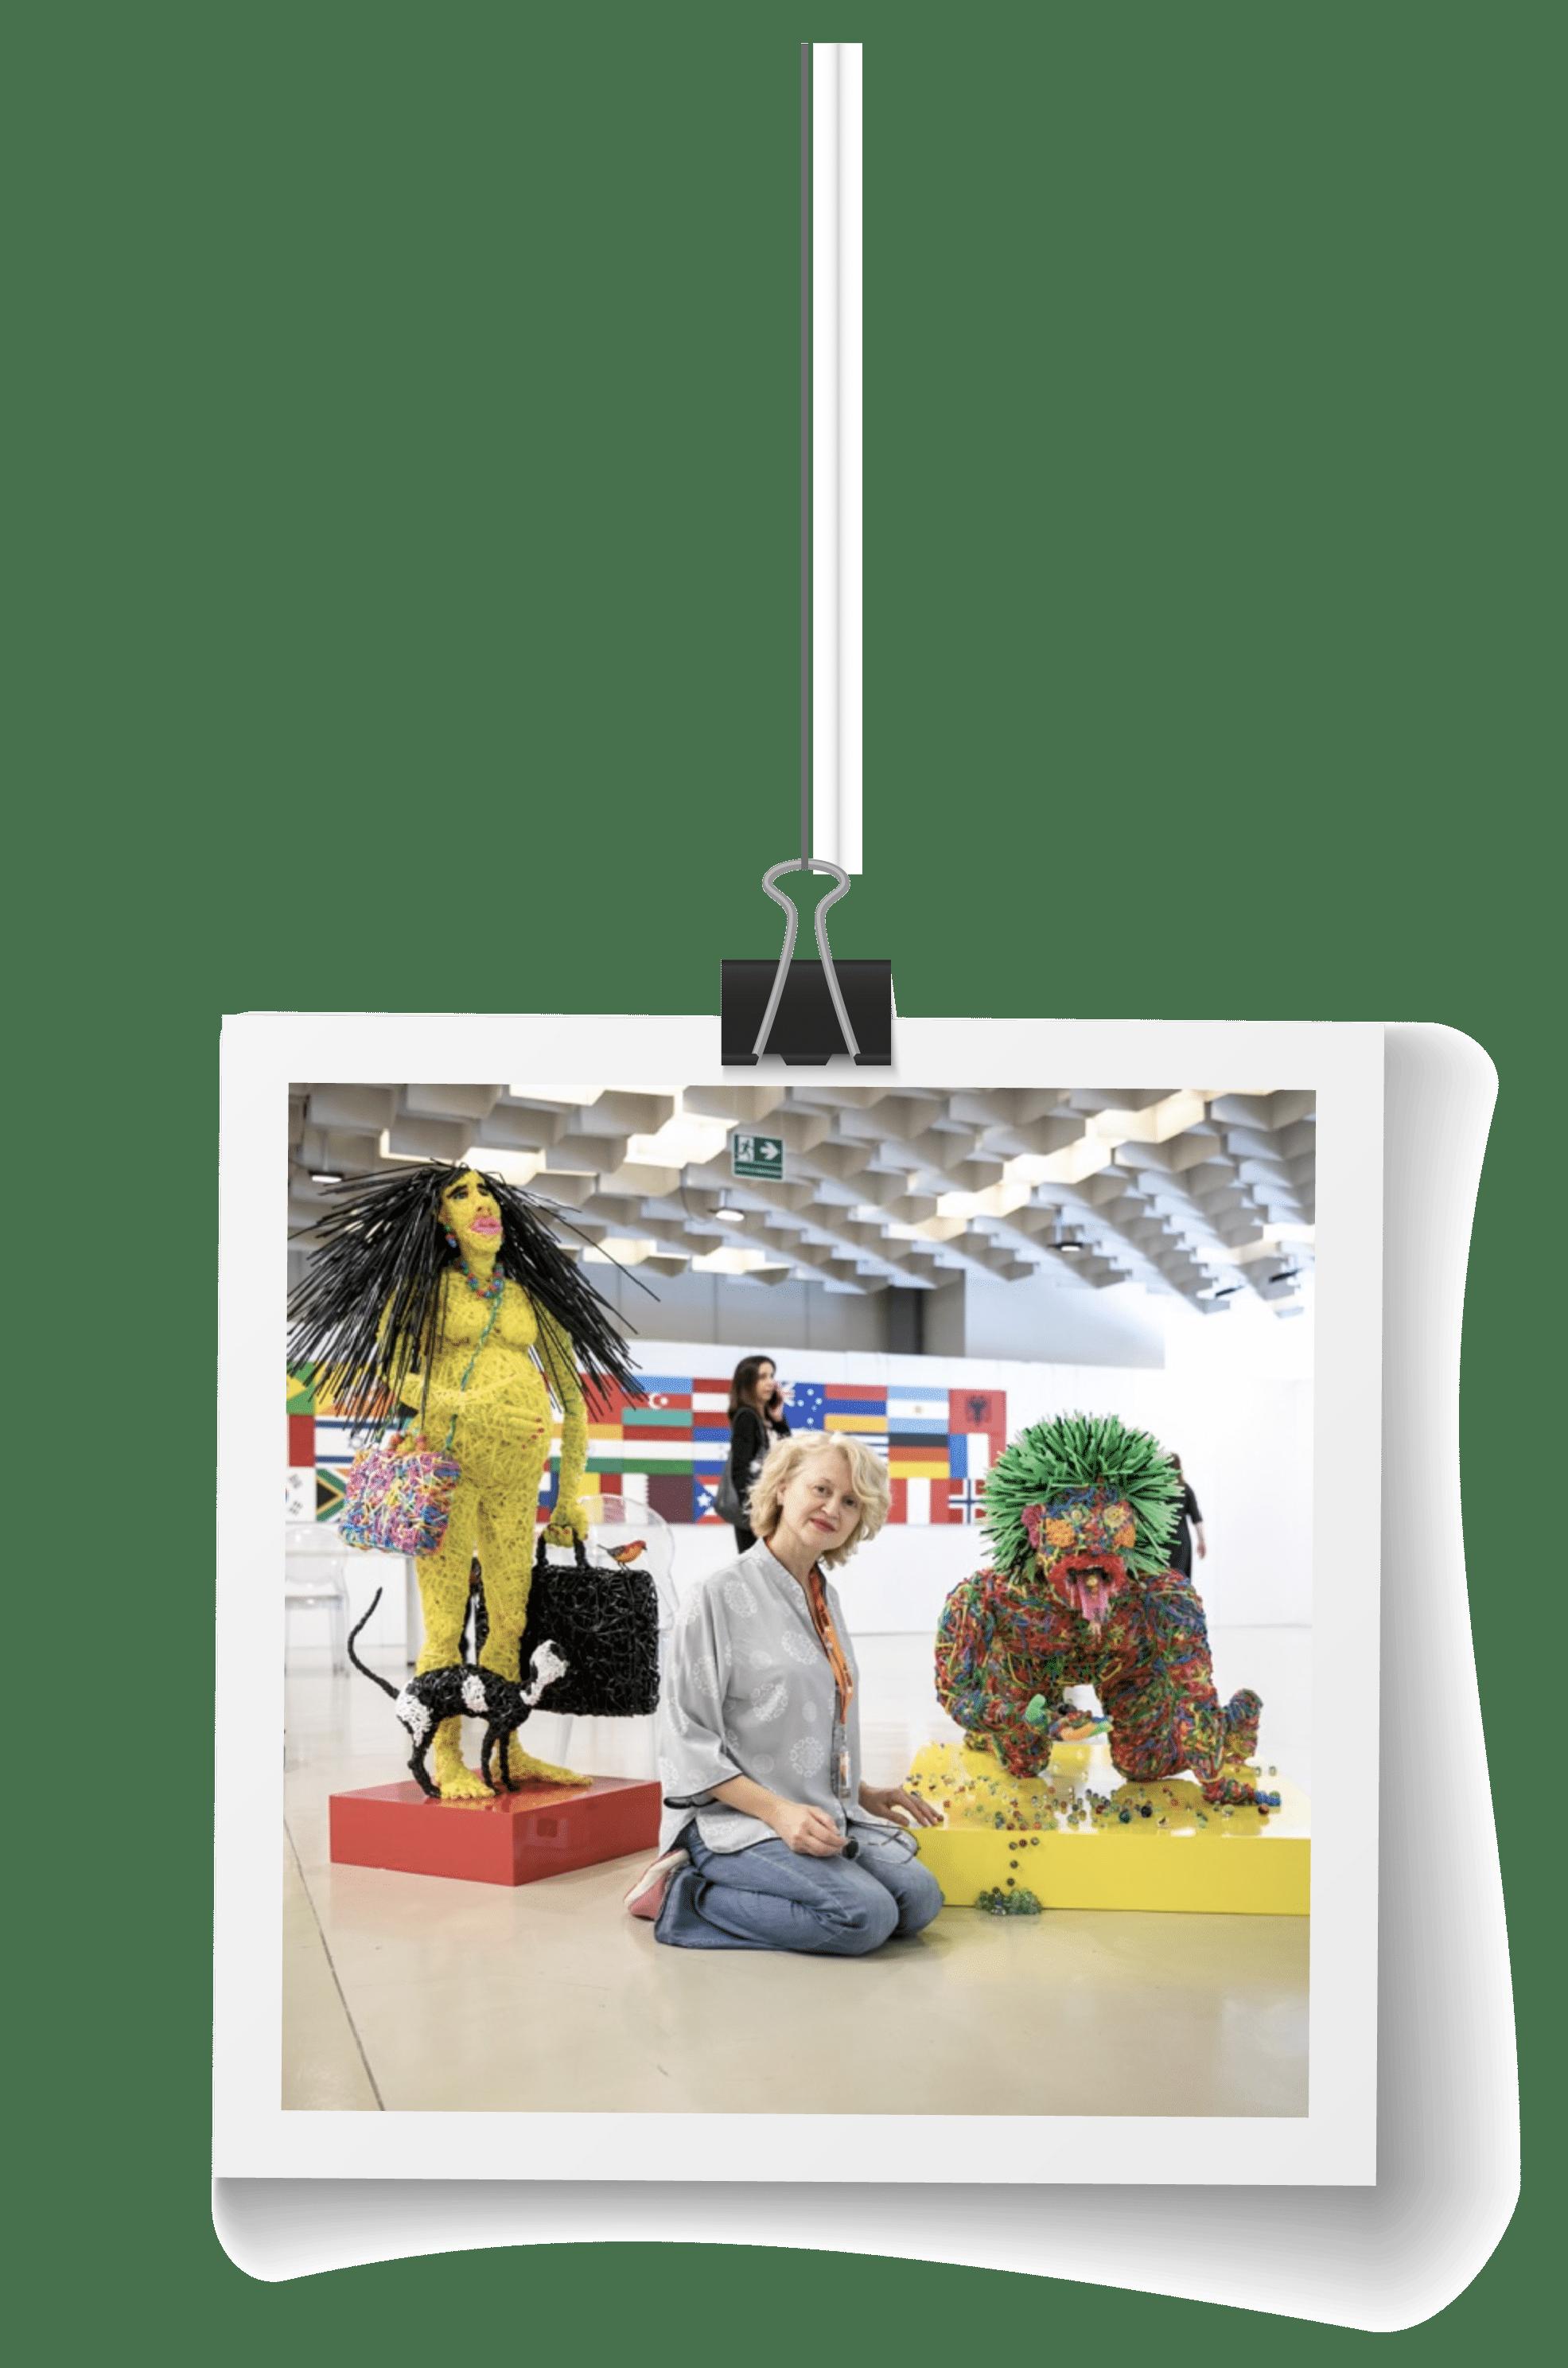 04-TEE-20-CONTEST BIENNALE-GIUGNO 2021-06